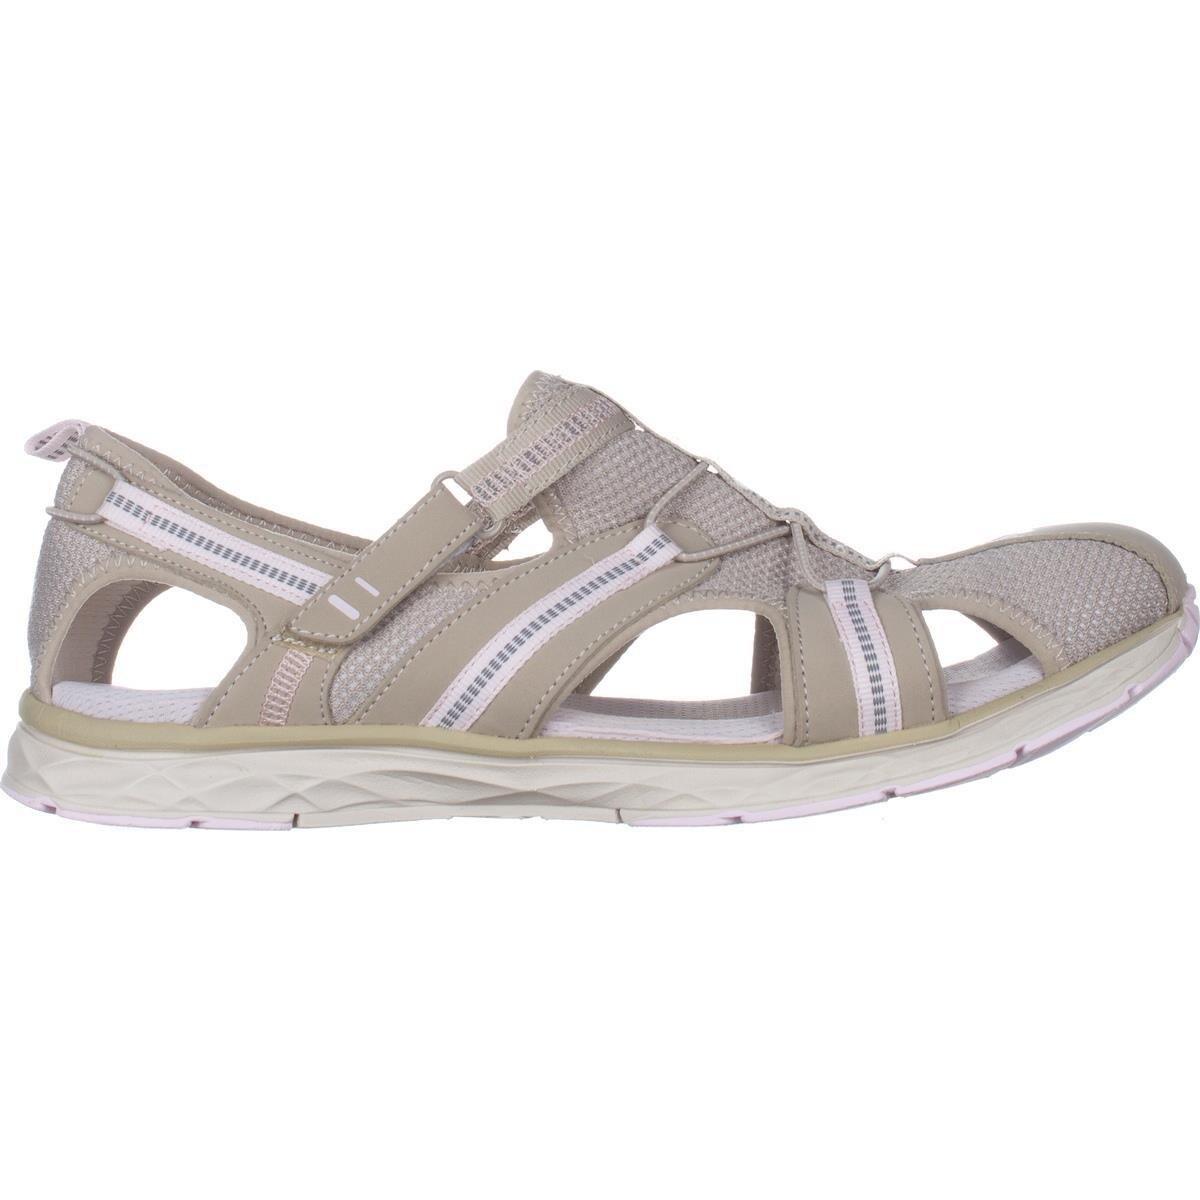 29ea41f0f920 Shop Dr. Scholl s Archie Fisherman Sport Sneakers